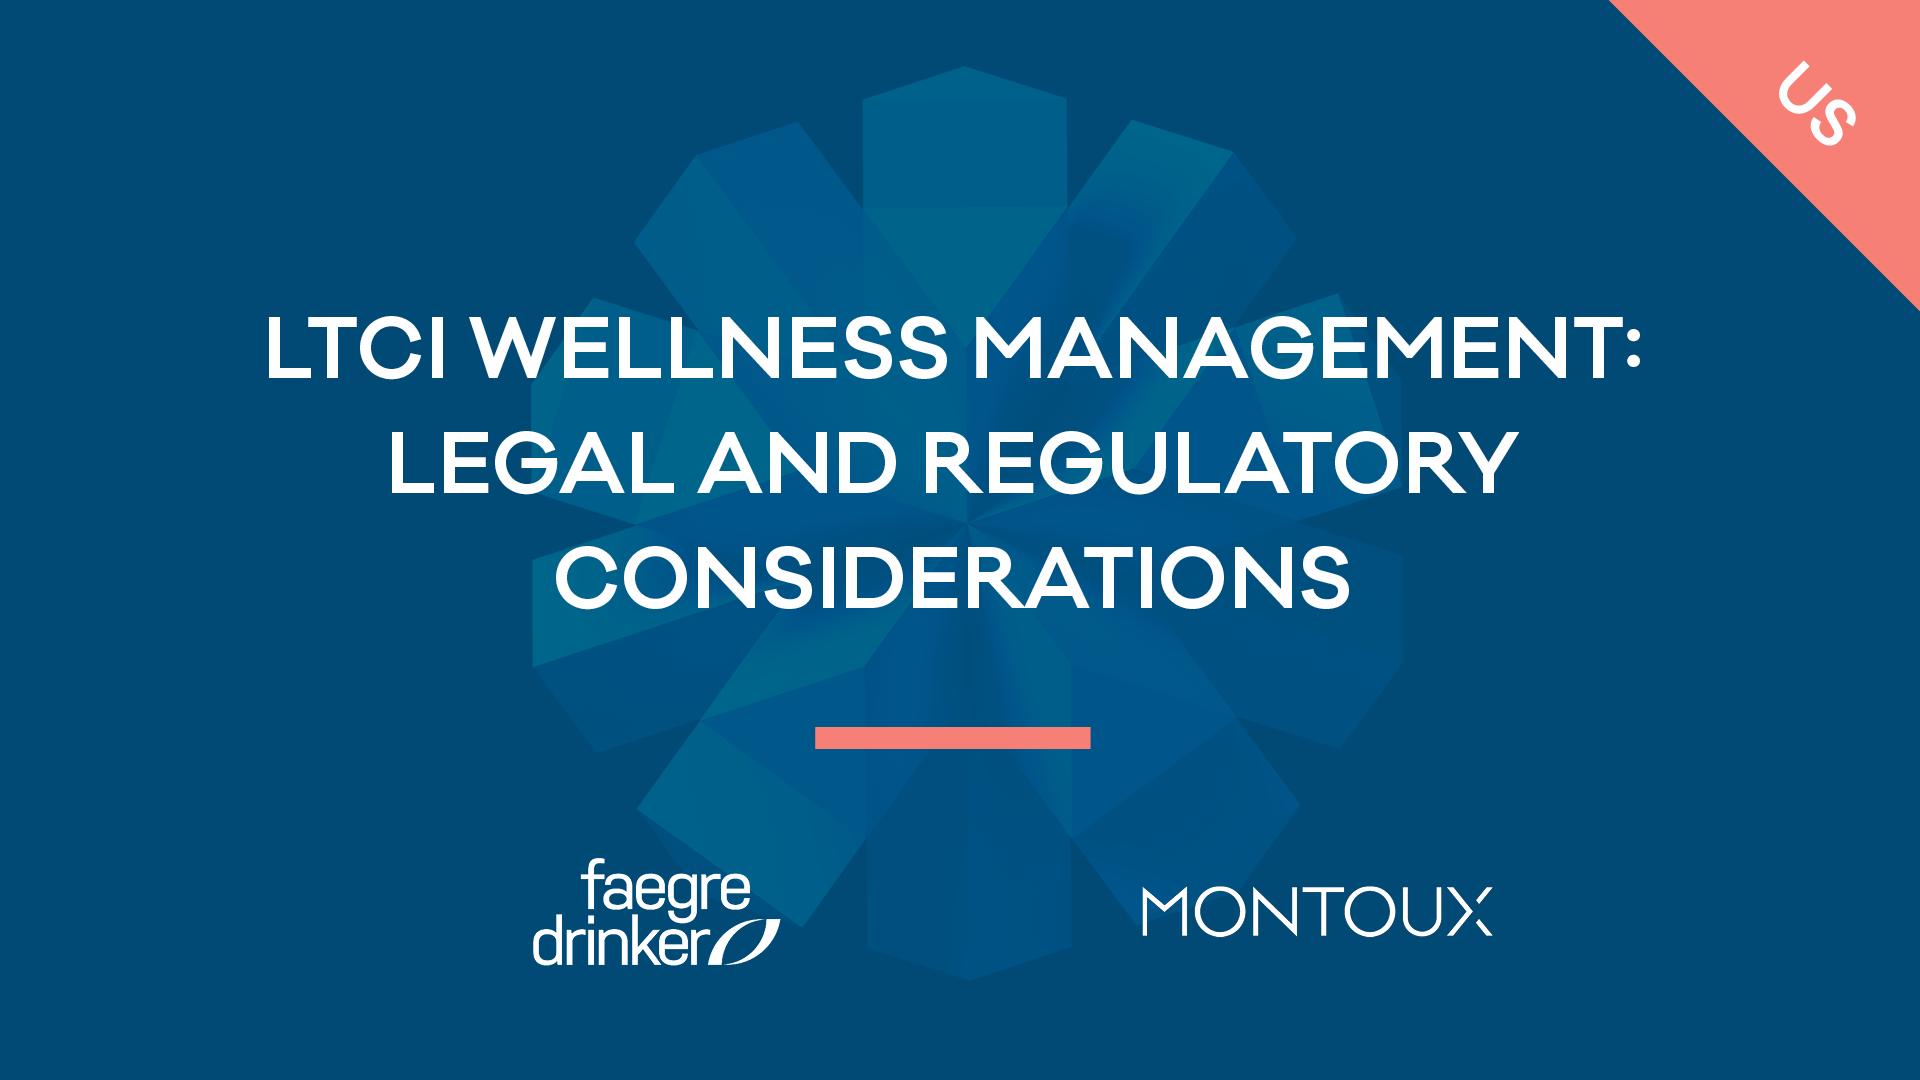 LTCI wellness management: Legal and regulatory considerations